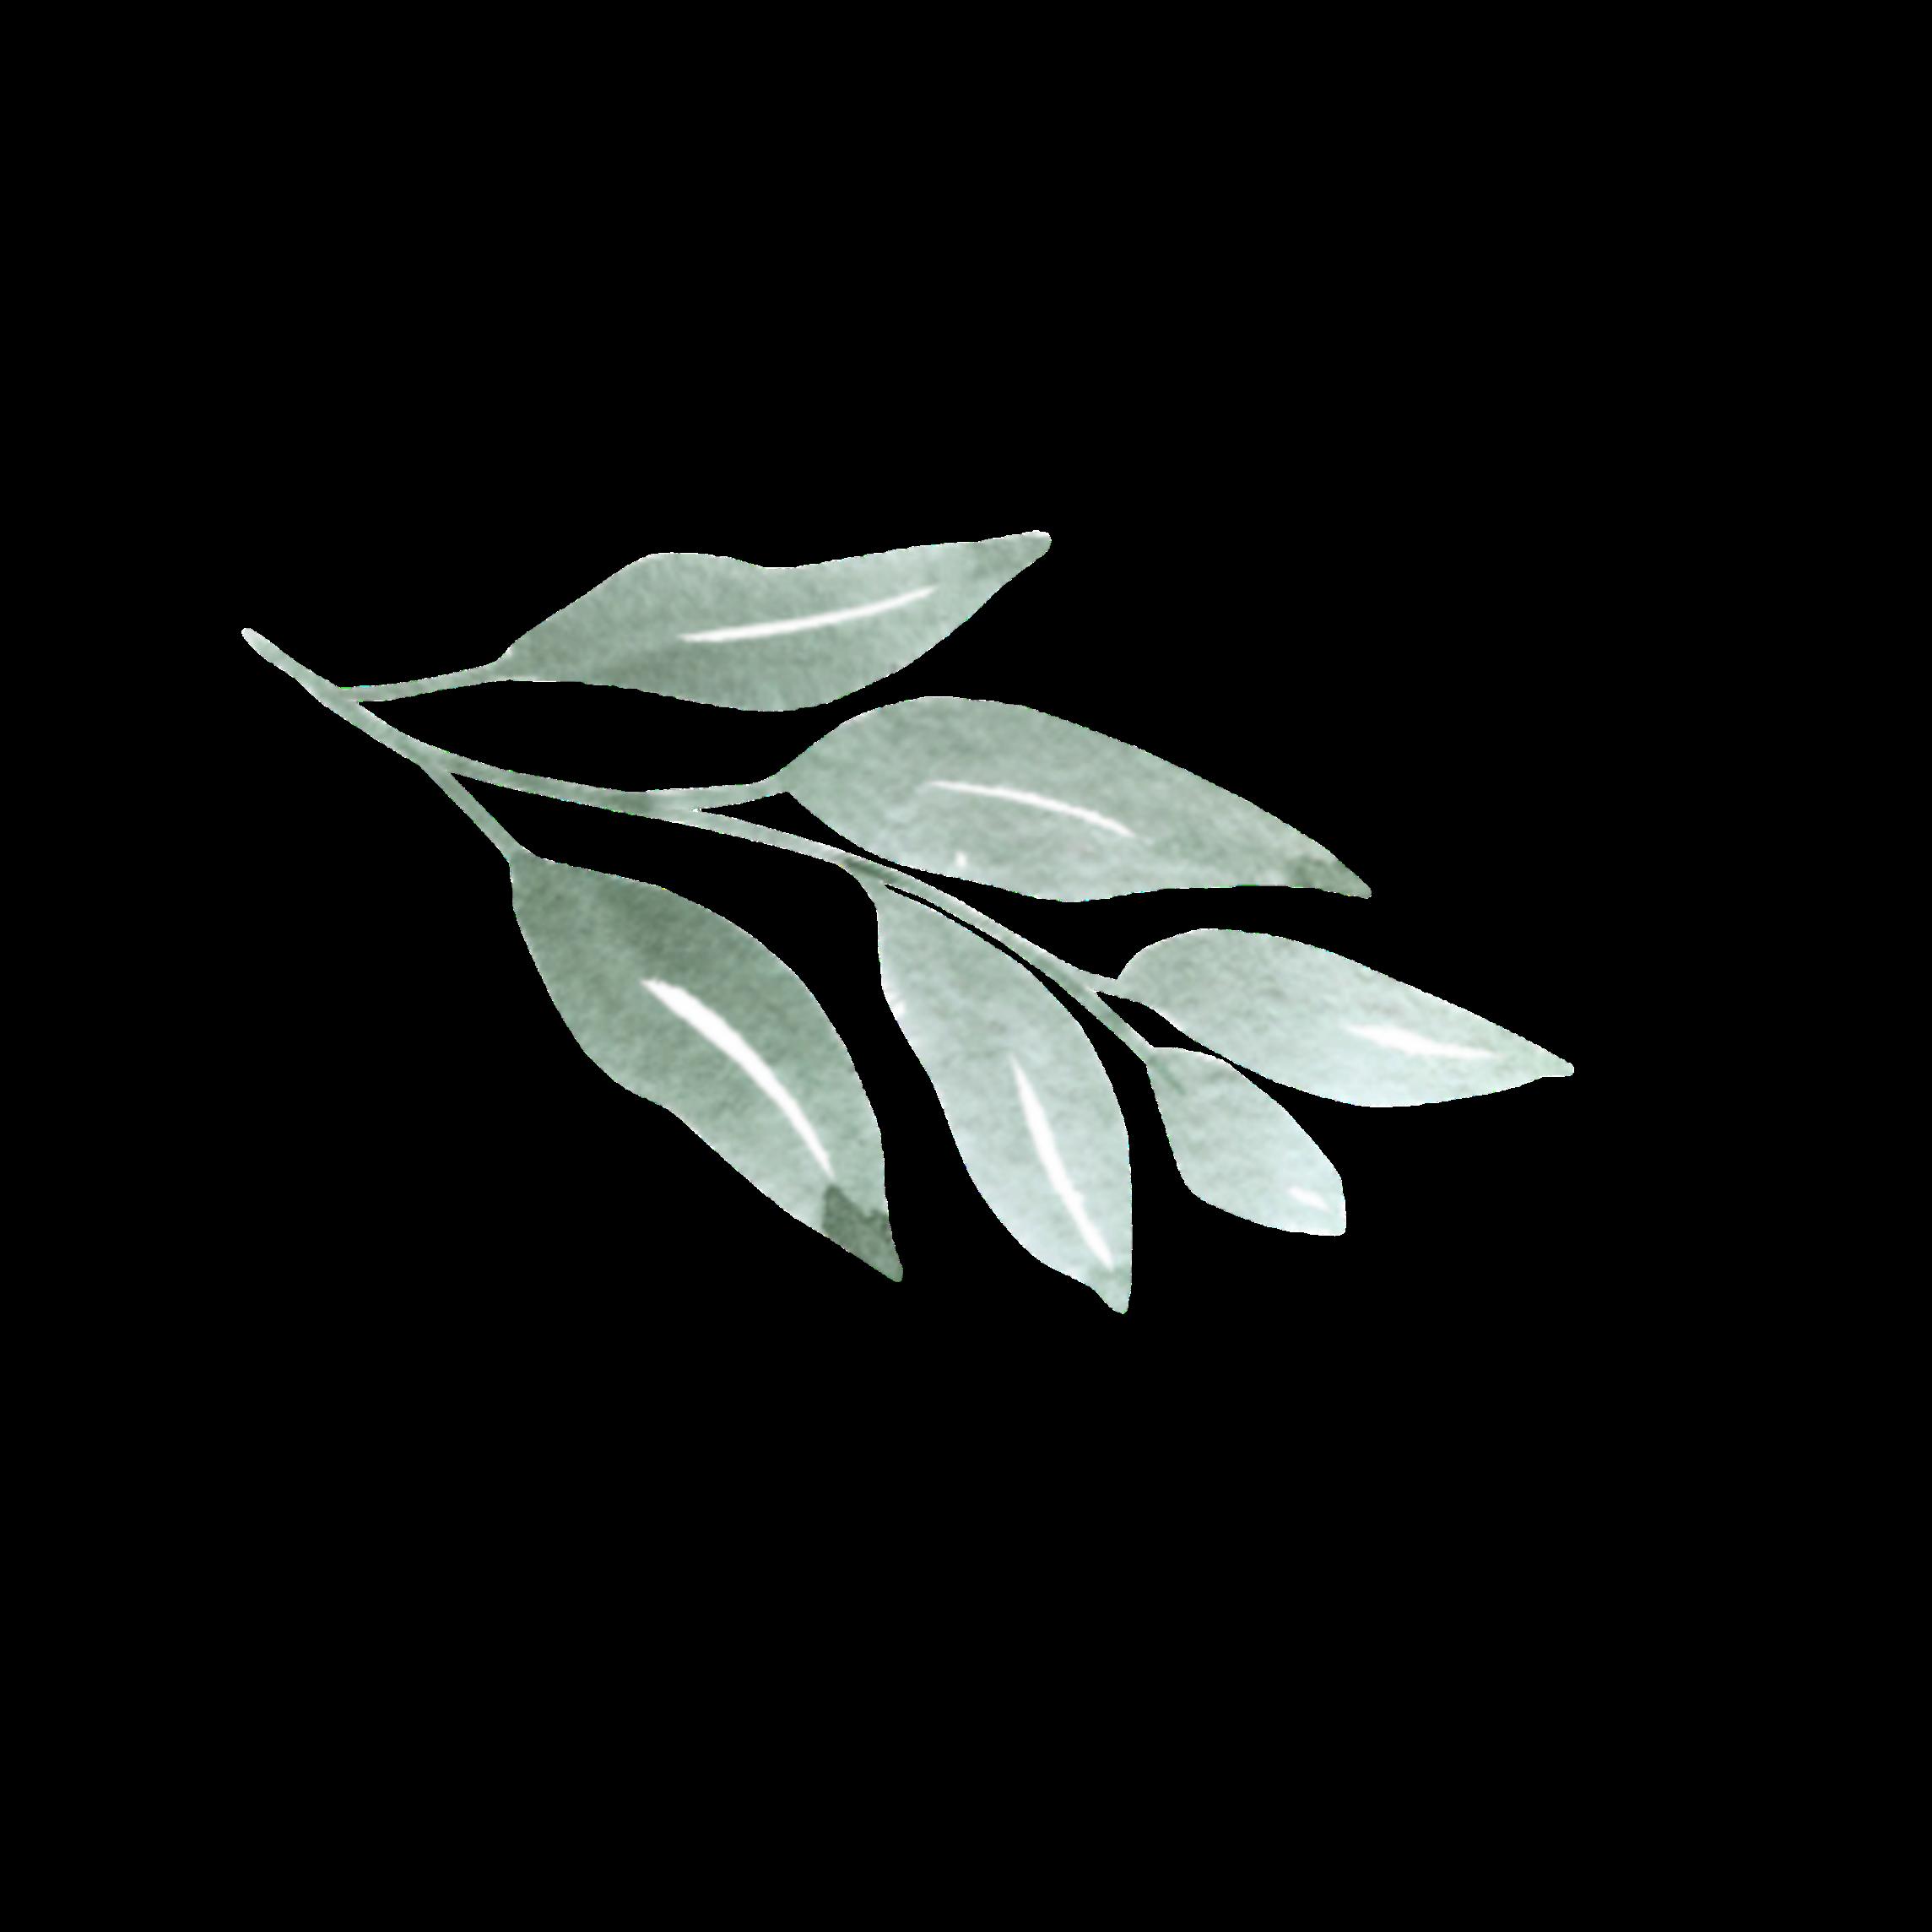 Freetoedit Leaves Tropical Aesthetic Plants Doodle Vintage Palmtree Remixit Plant Aesthetic Image Stickers Plants